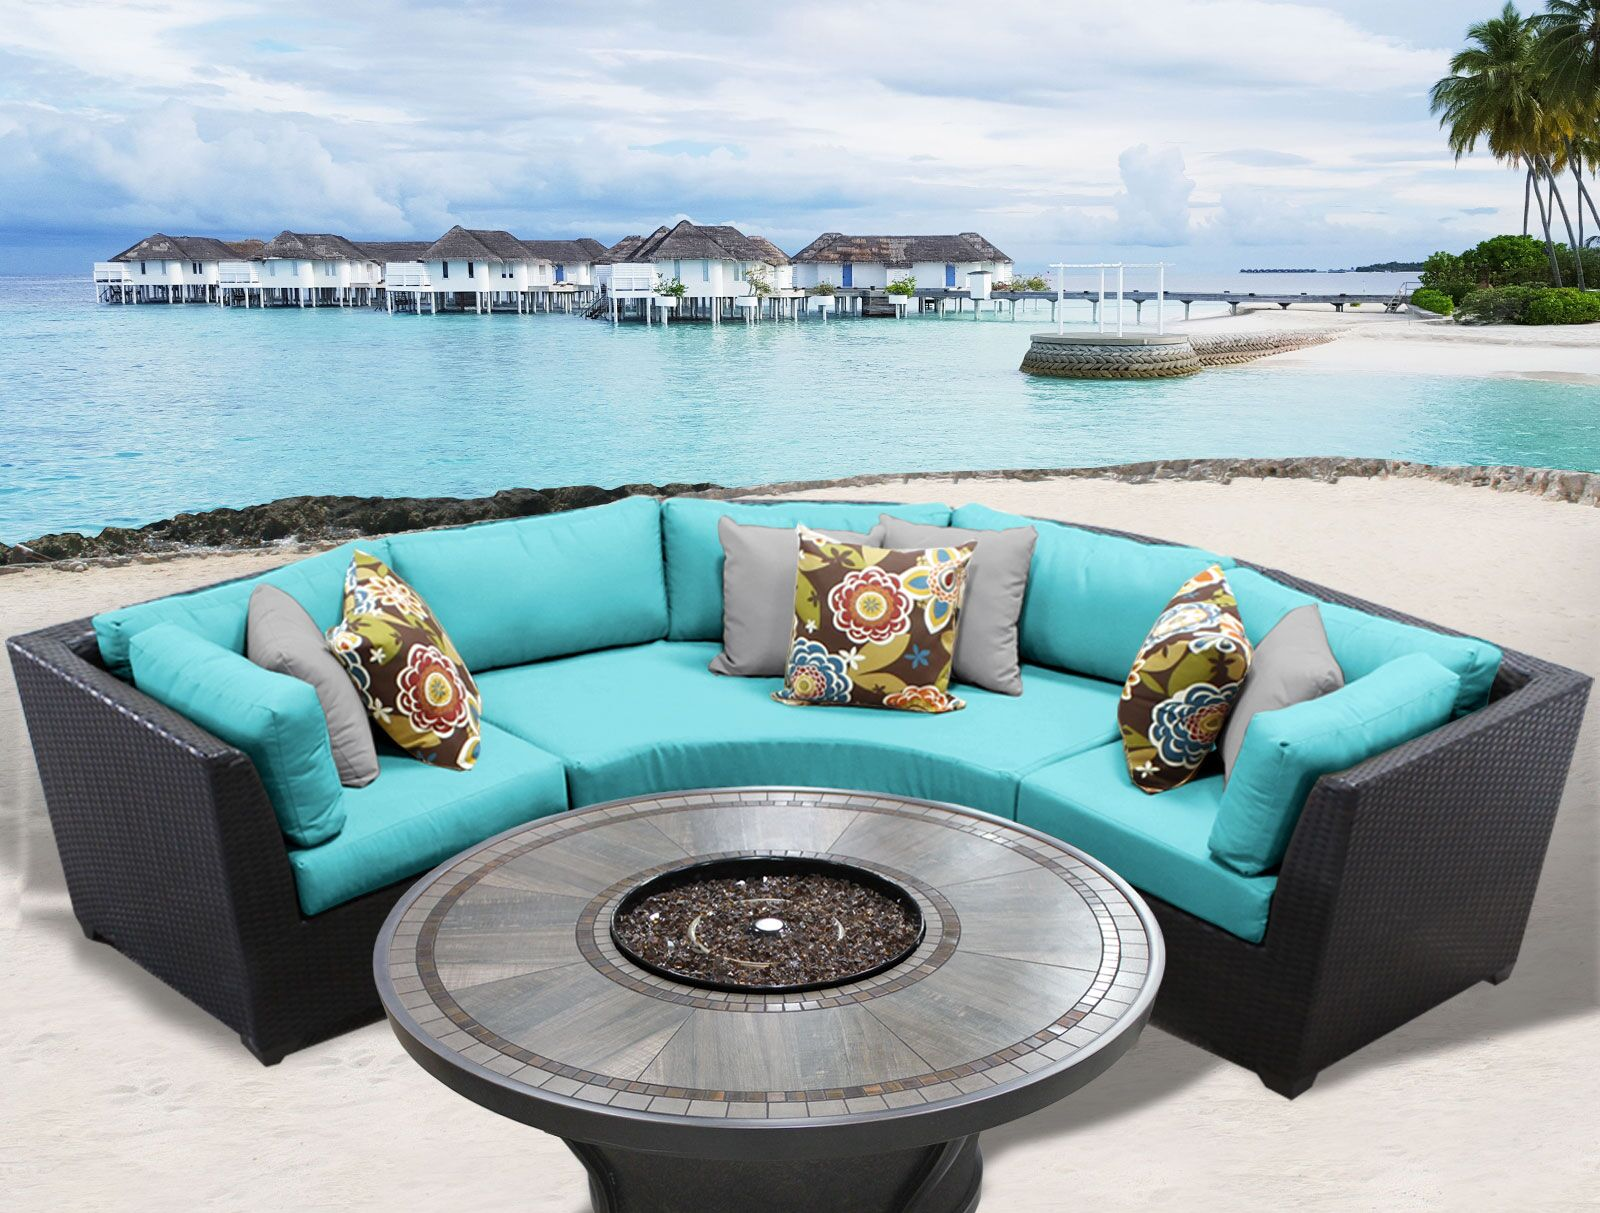 Barbados 4 Piece Rattan Sectional Set with Cushions Cushion Color: Aruba